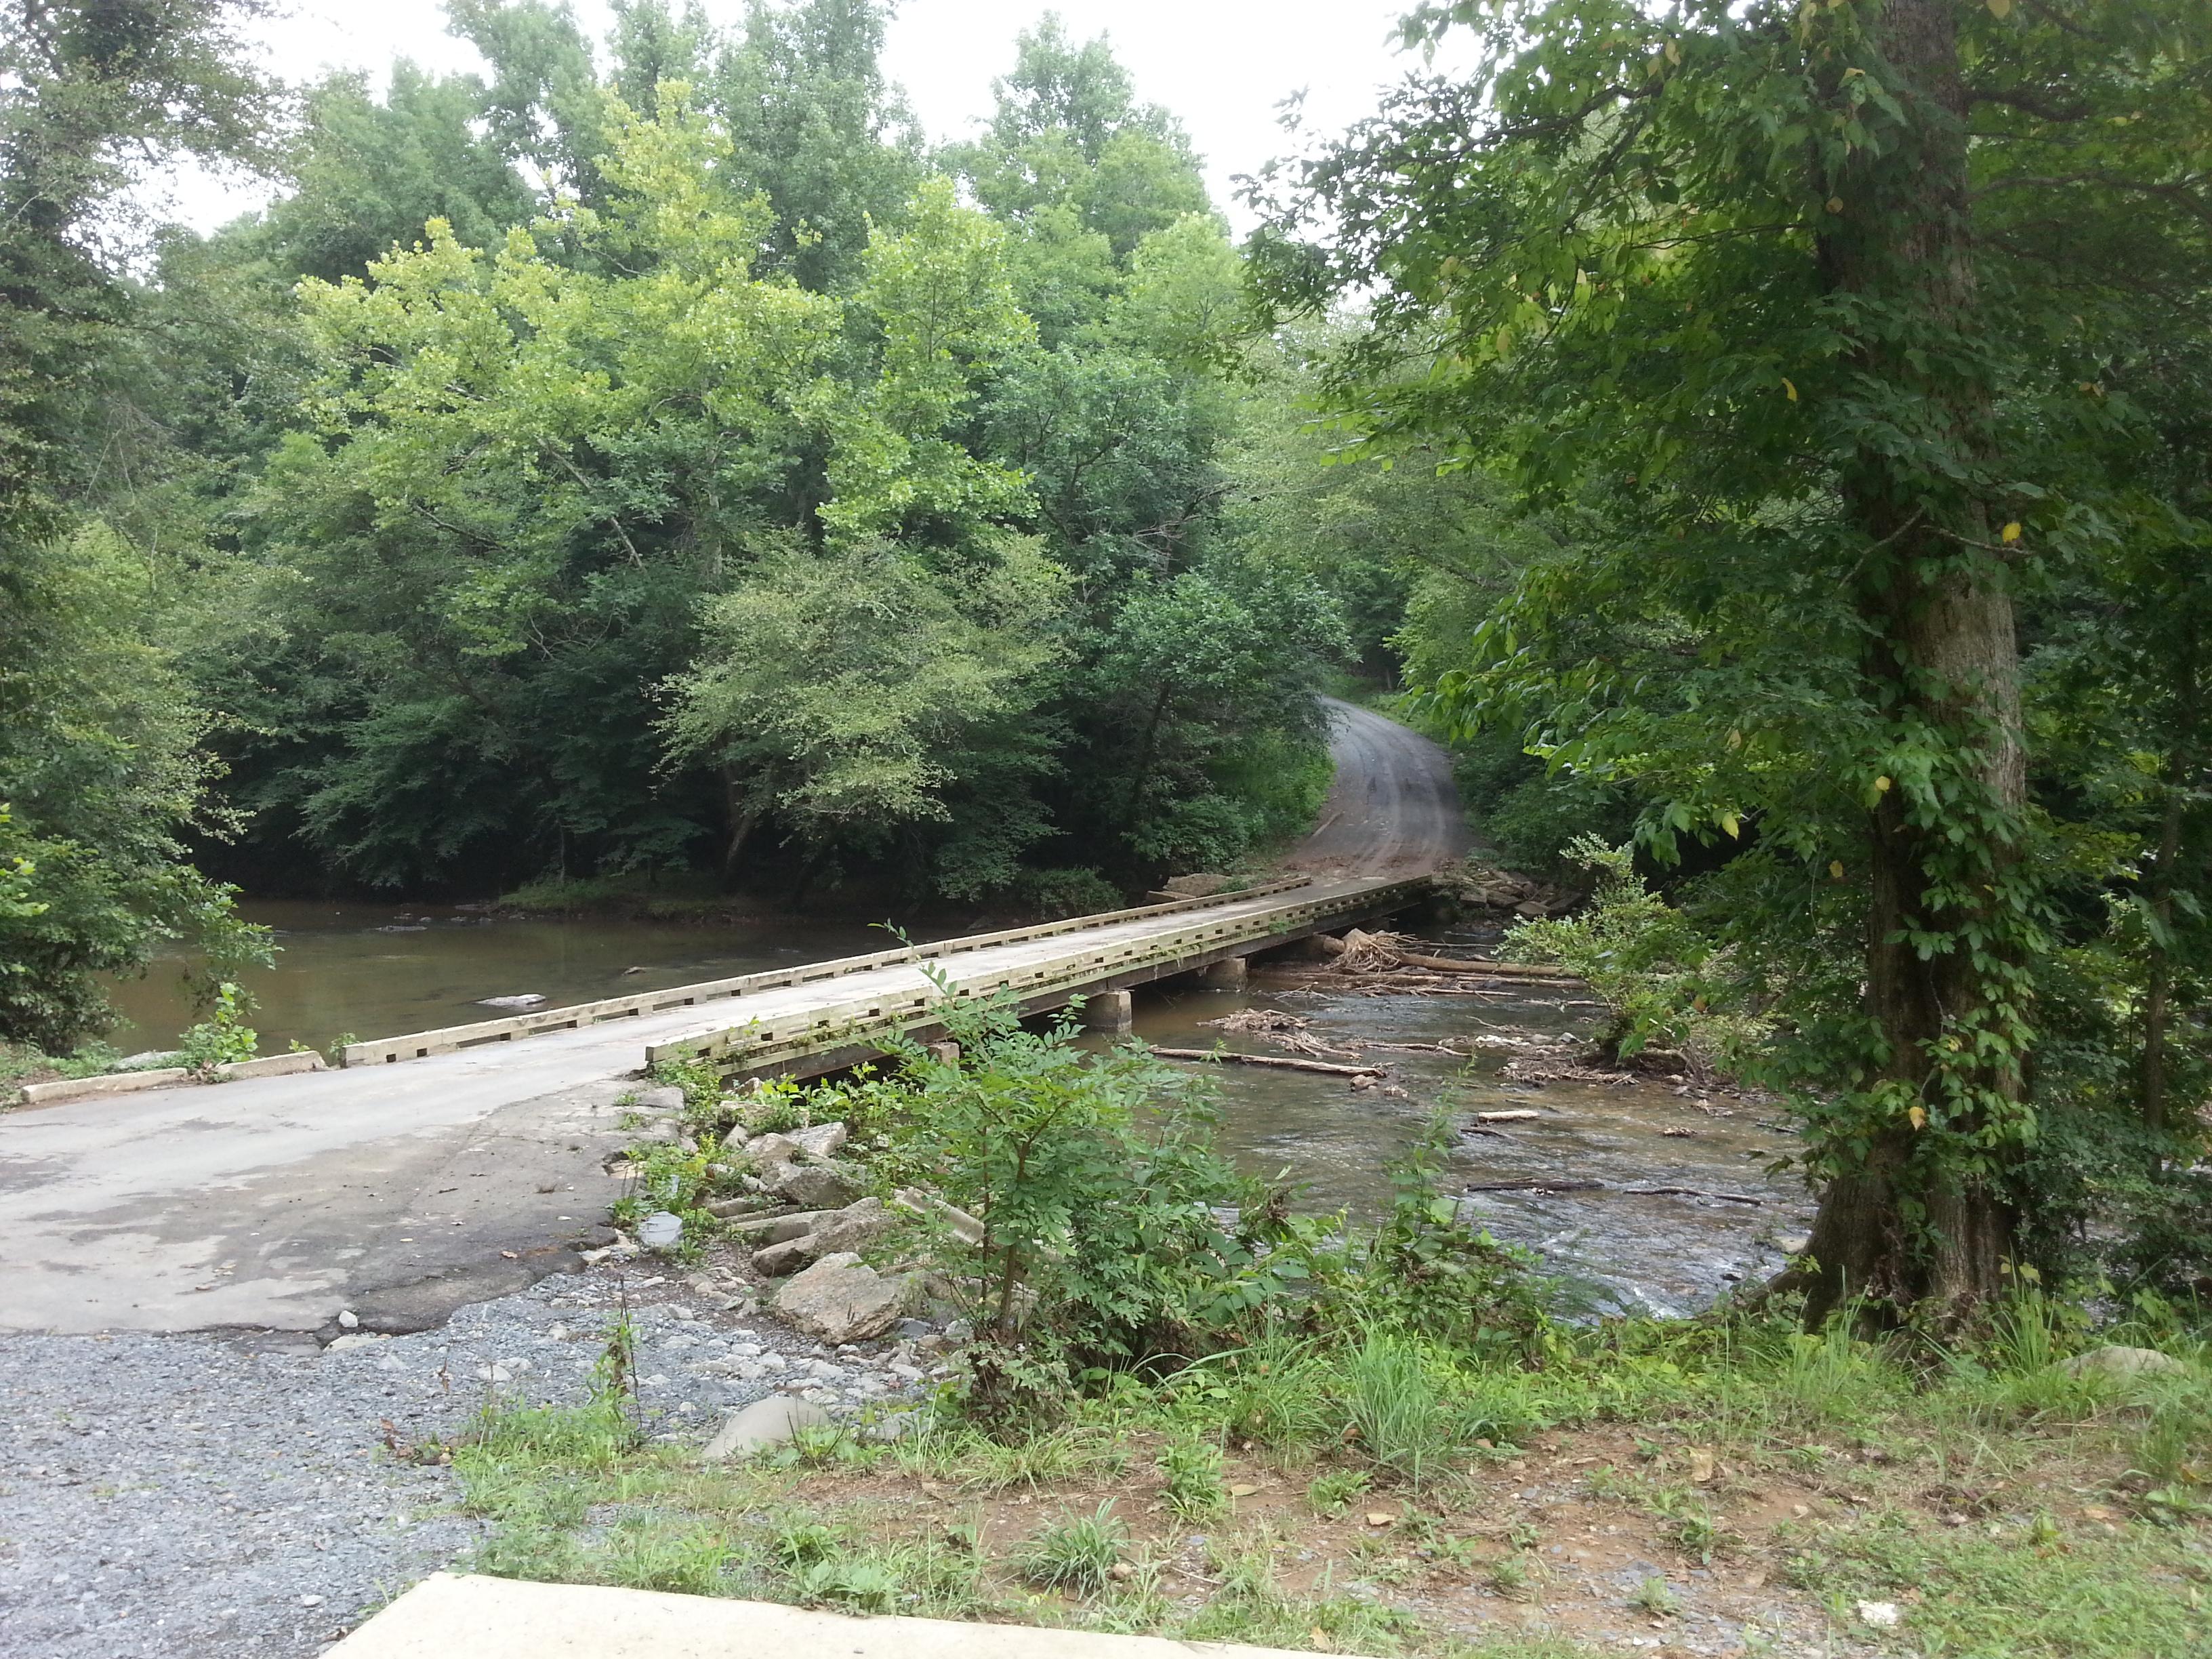 bridge in the gravel road over a creek